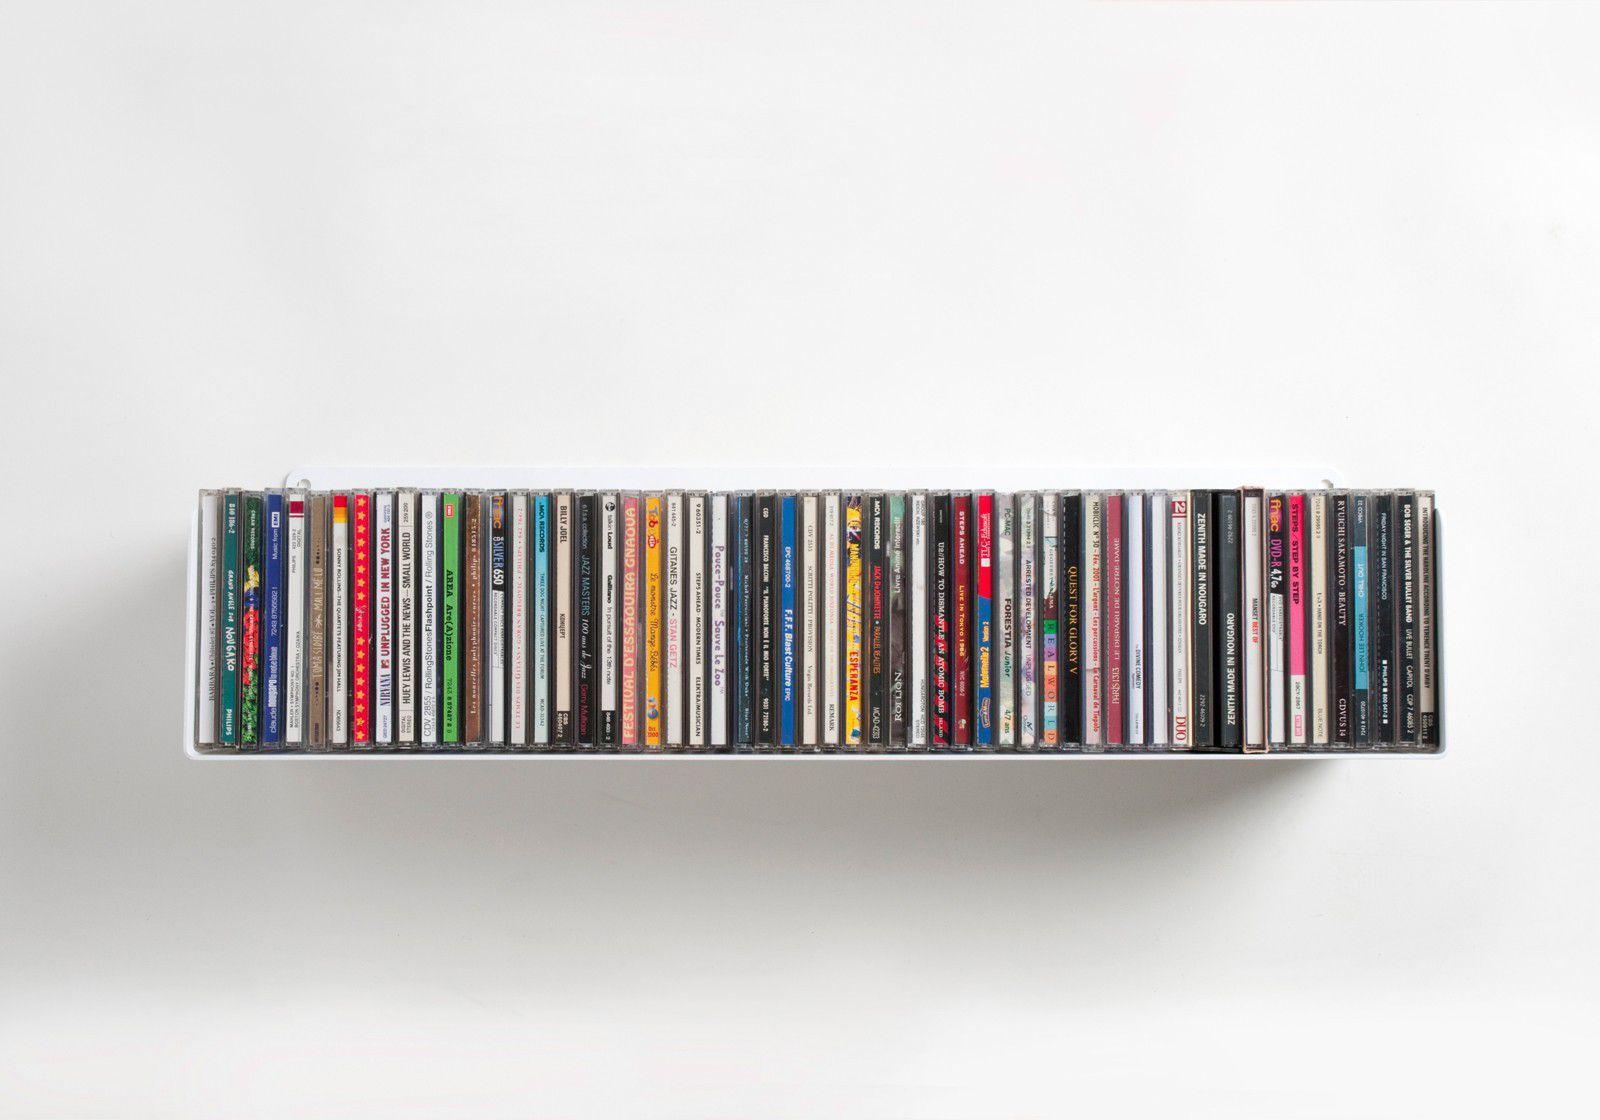 Étagère cd | Étagères murales - teebooks